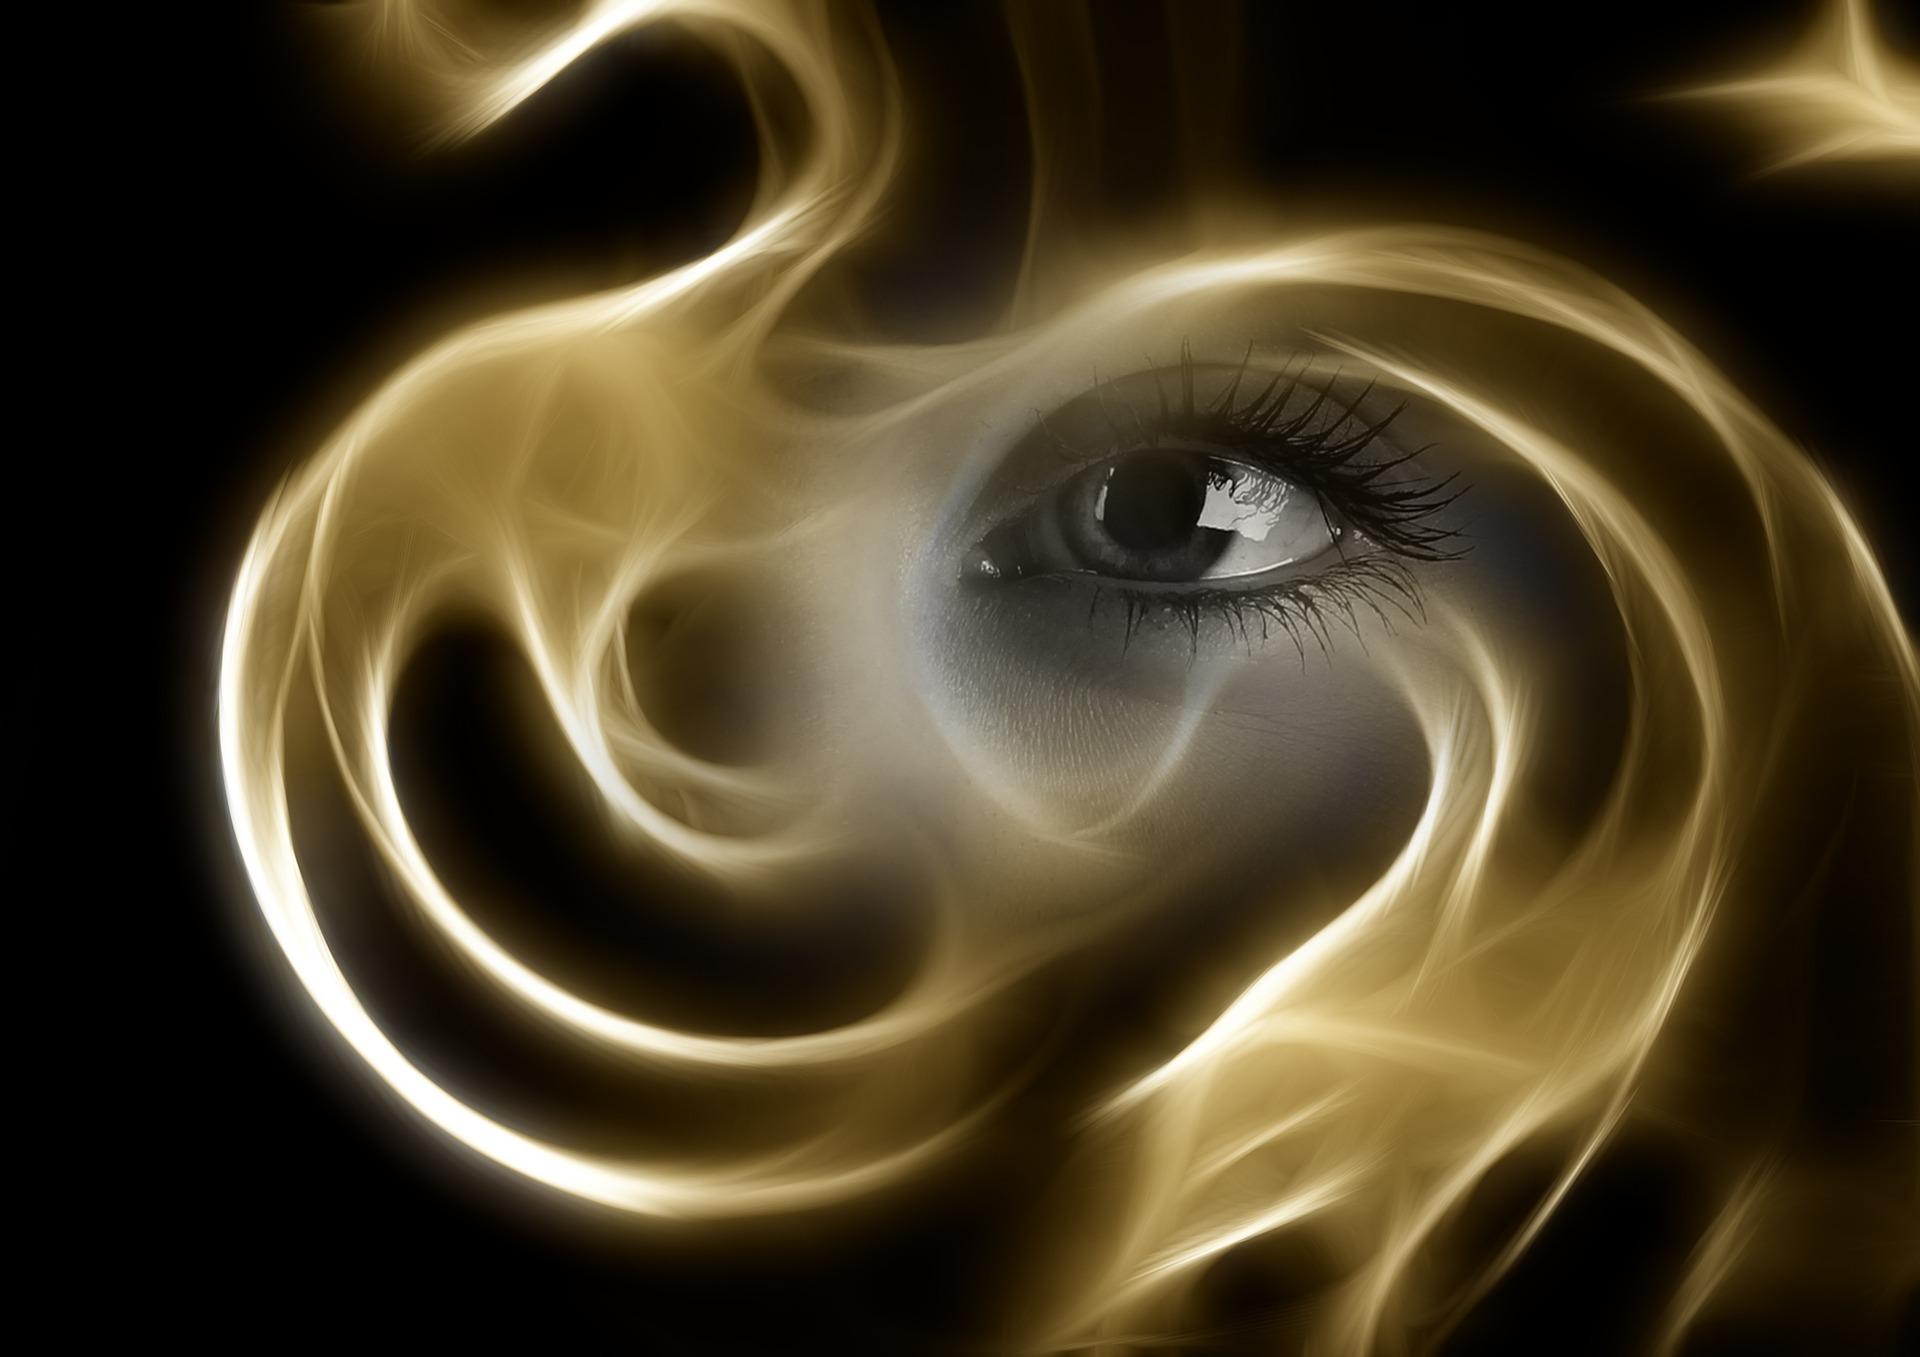 eye soul ghosts spirit